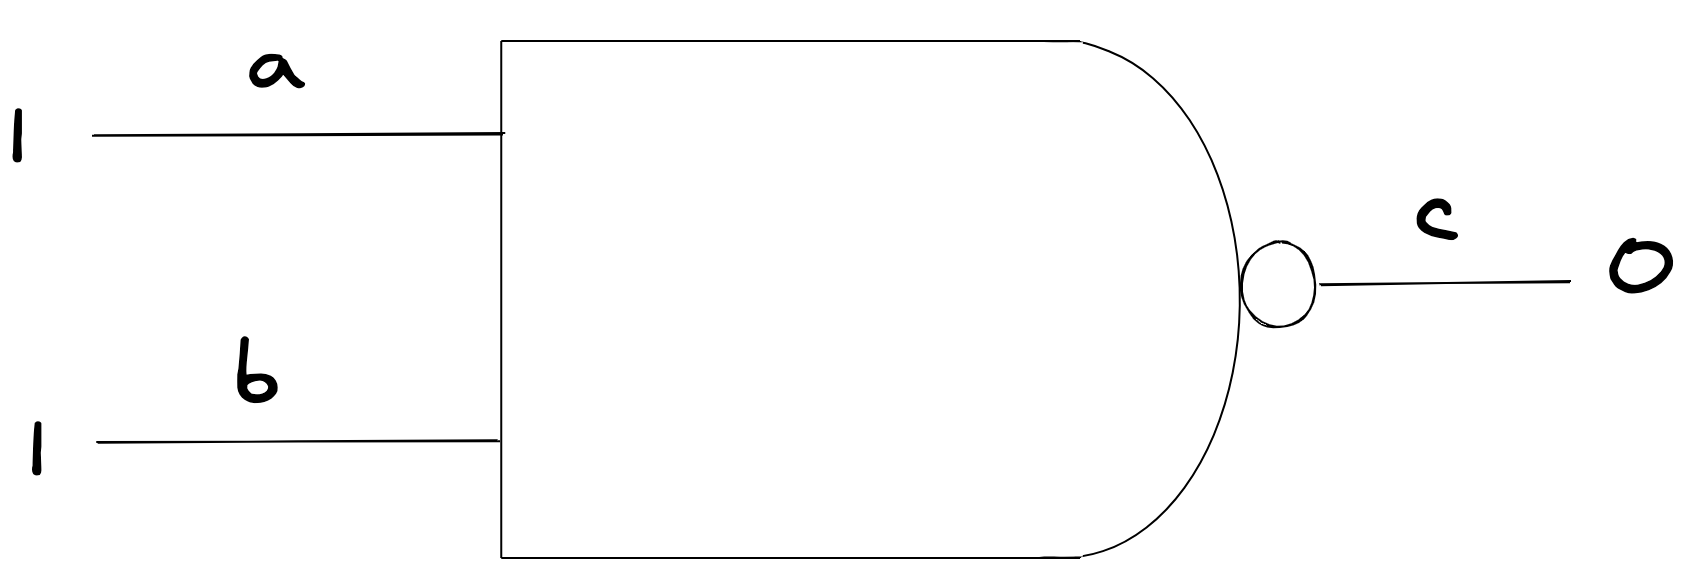 umair-akbar-aHR0cHM6Ly91c2VyLWltYWdlcy5naXRodWJ1c2VyY29udGVudC5jb20vOTg0NTc0Lzk1Nzc2NTU3LTk0NmYxYjAwLTBjOTItMTFlYi05NGZkLTNlM2JkMzI5OWYwNC5wbmc - Simulating RAM in Clojure